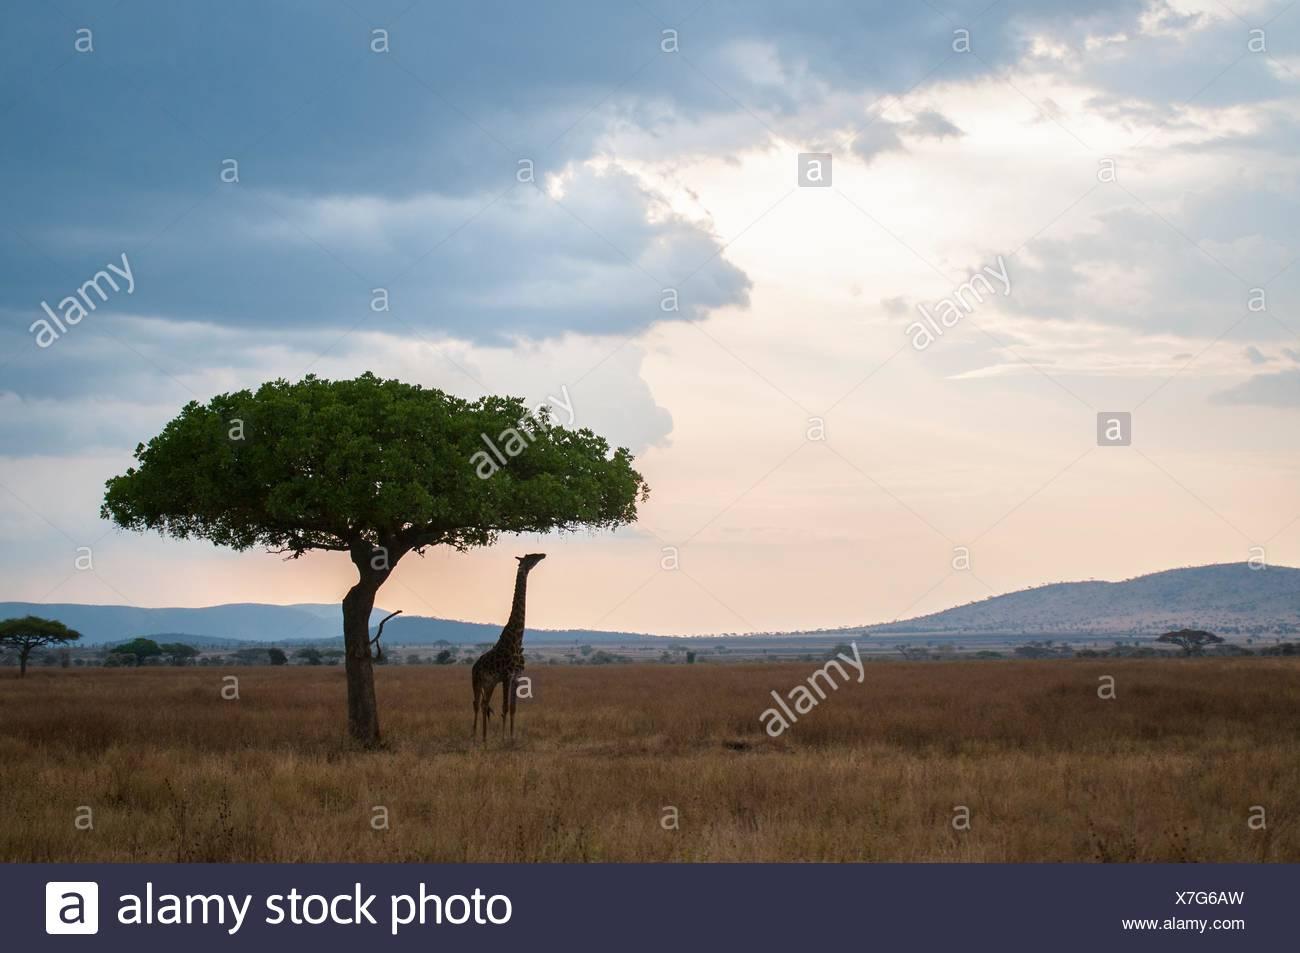 Giraffe für Baum erreichen lässt bei Dämmerung, Masai Mara, Kenia Stockbild